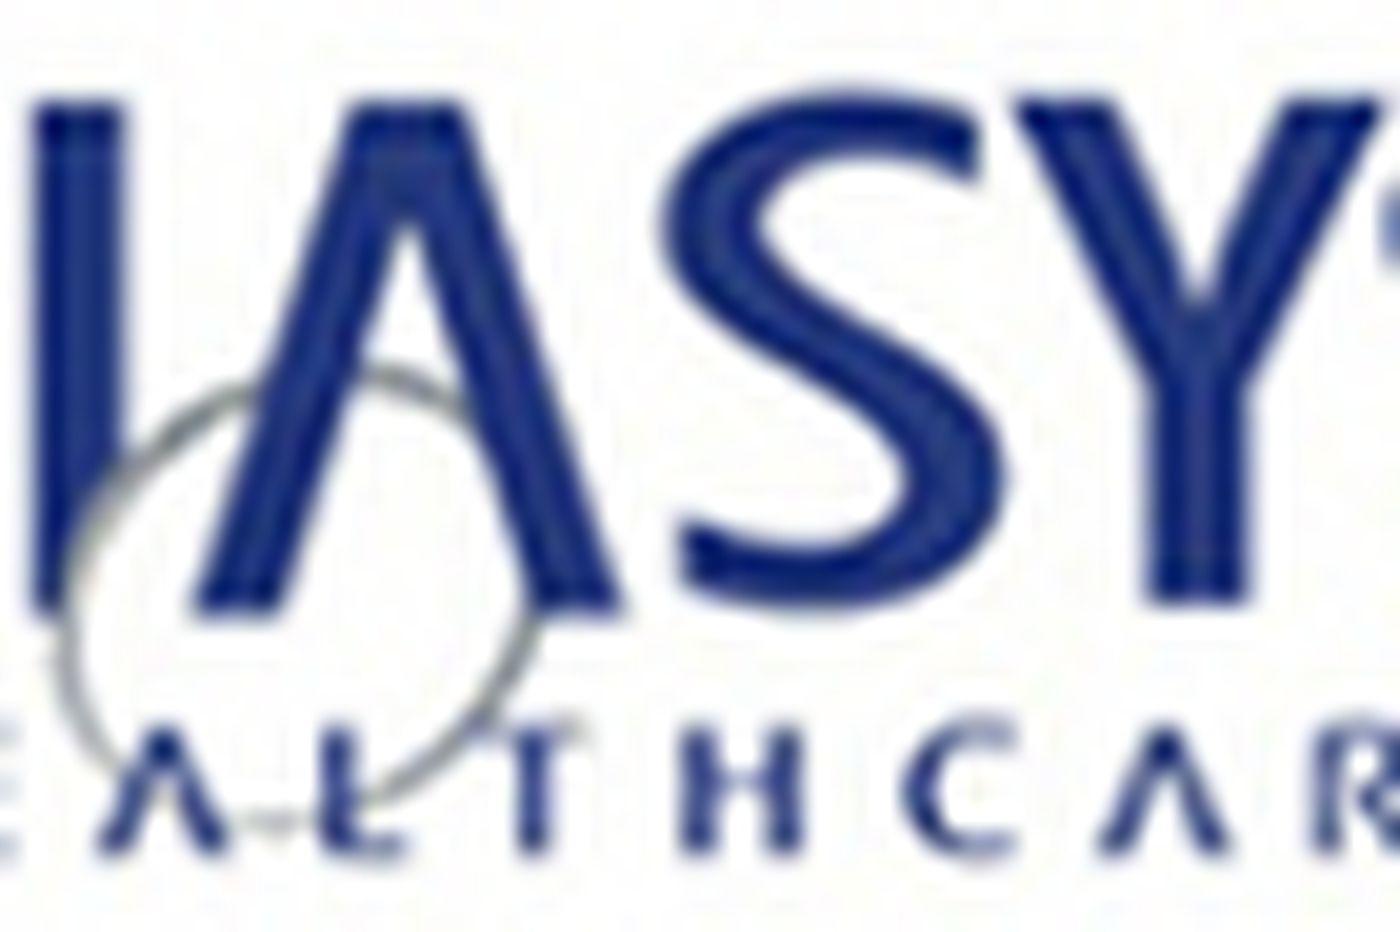 Conshohocken medical tech company to be bought for $1.5 billion